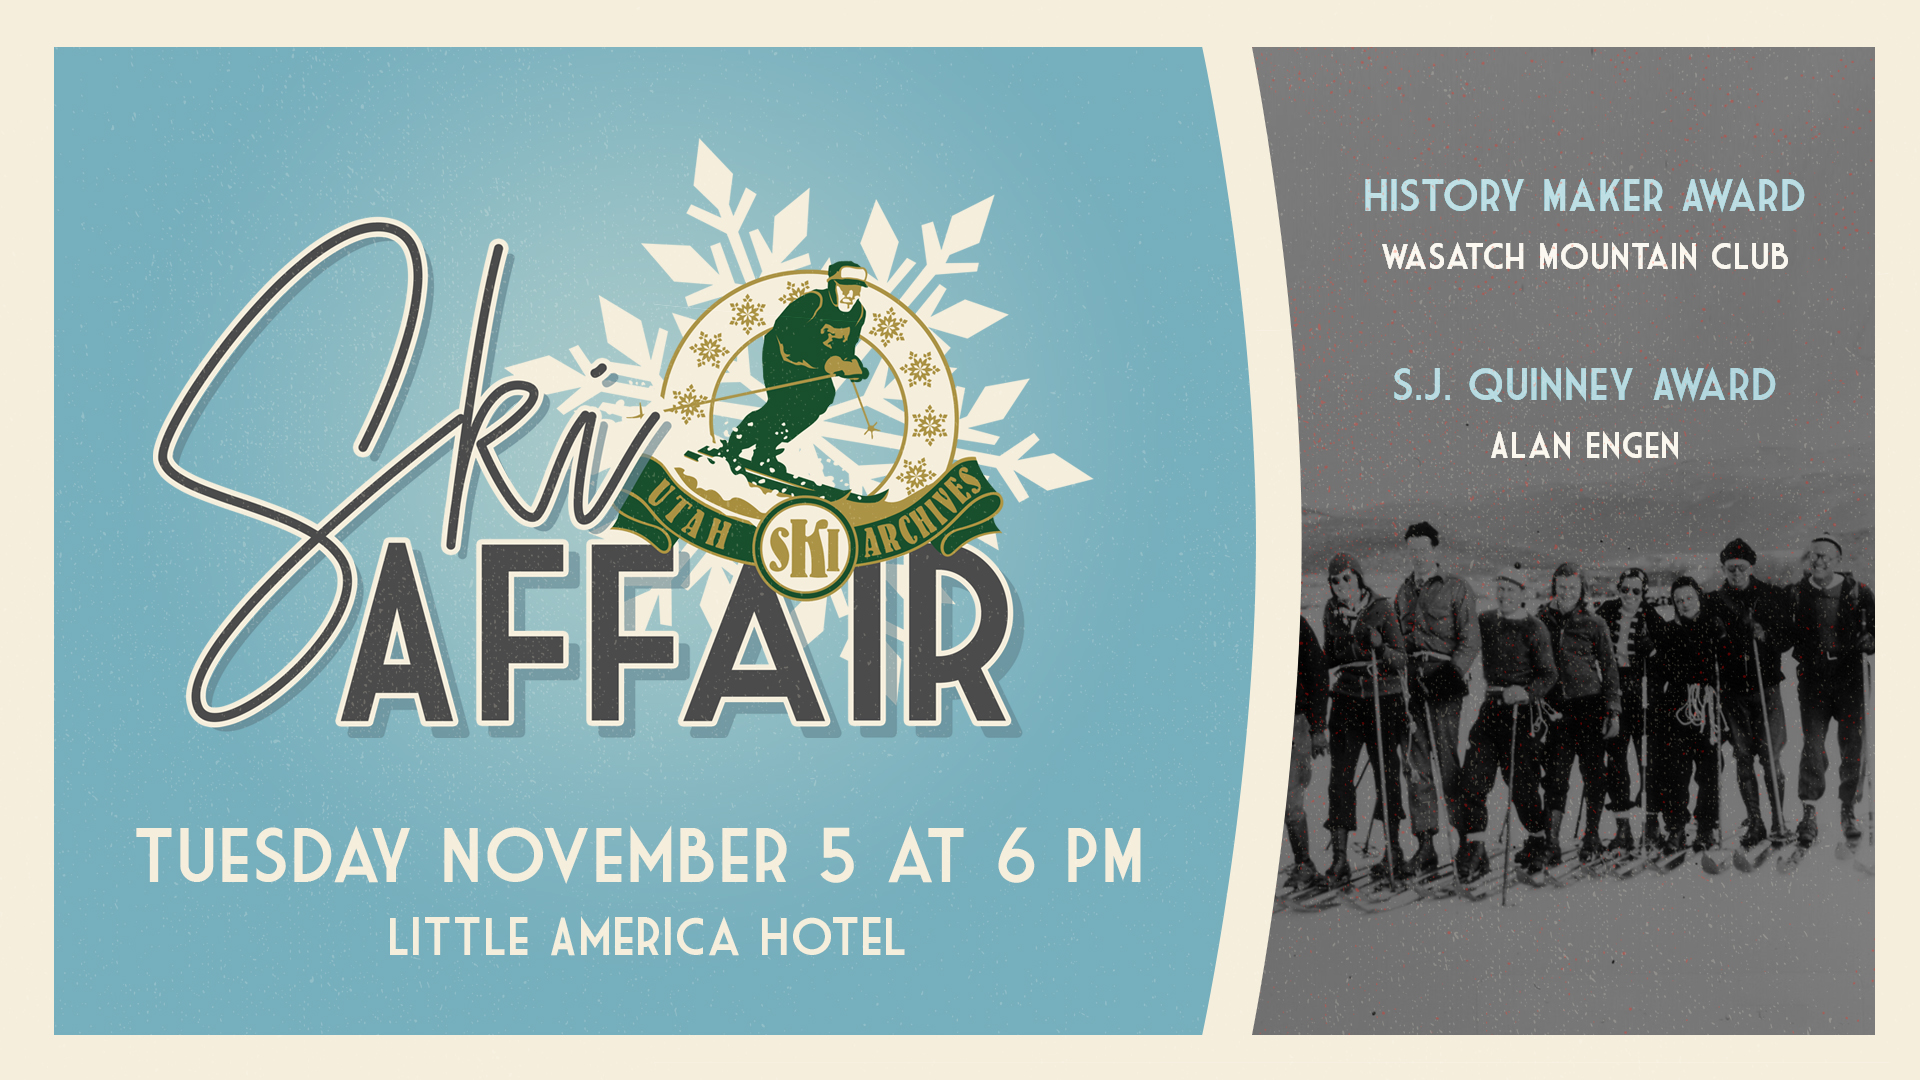 Ski affair tuesday november 5 at 6 pm little america hotel